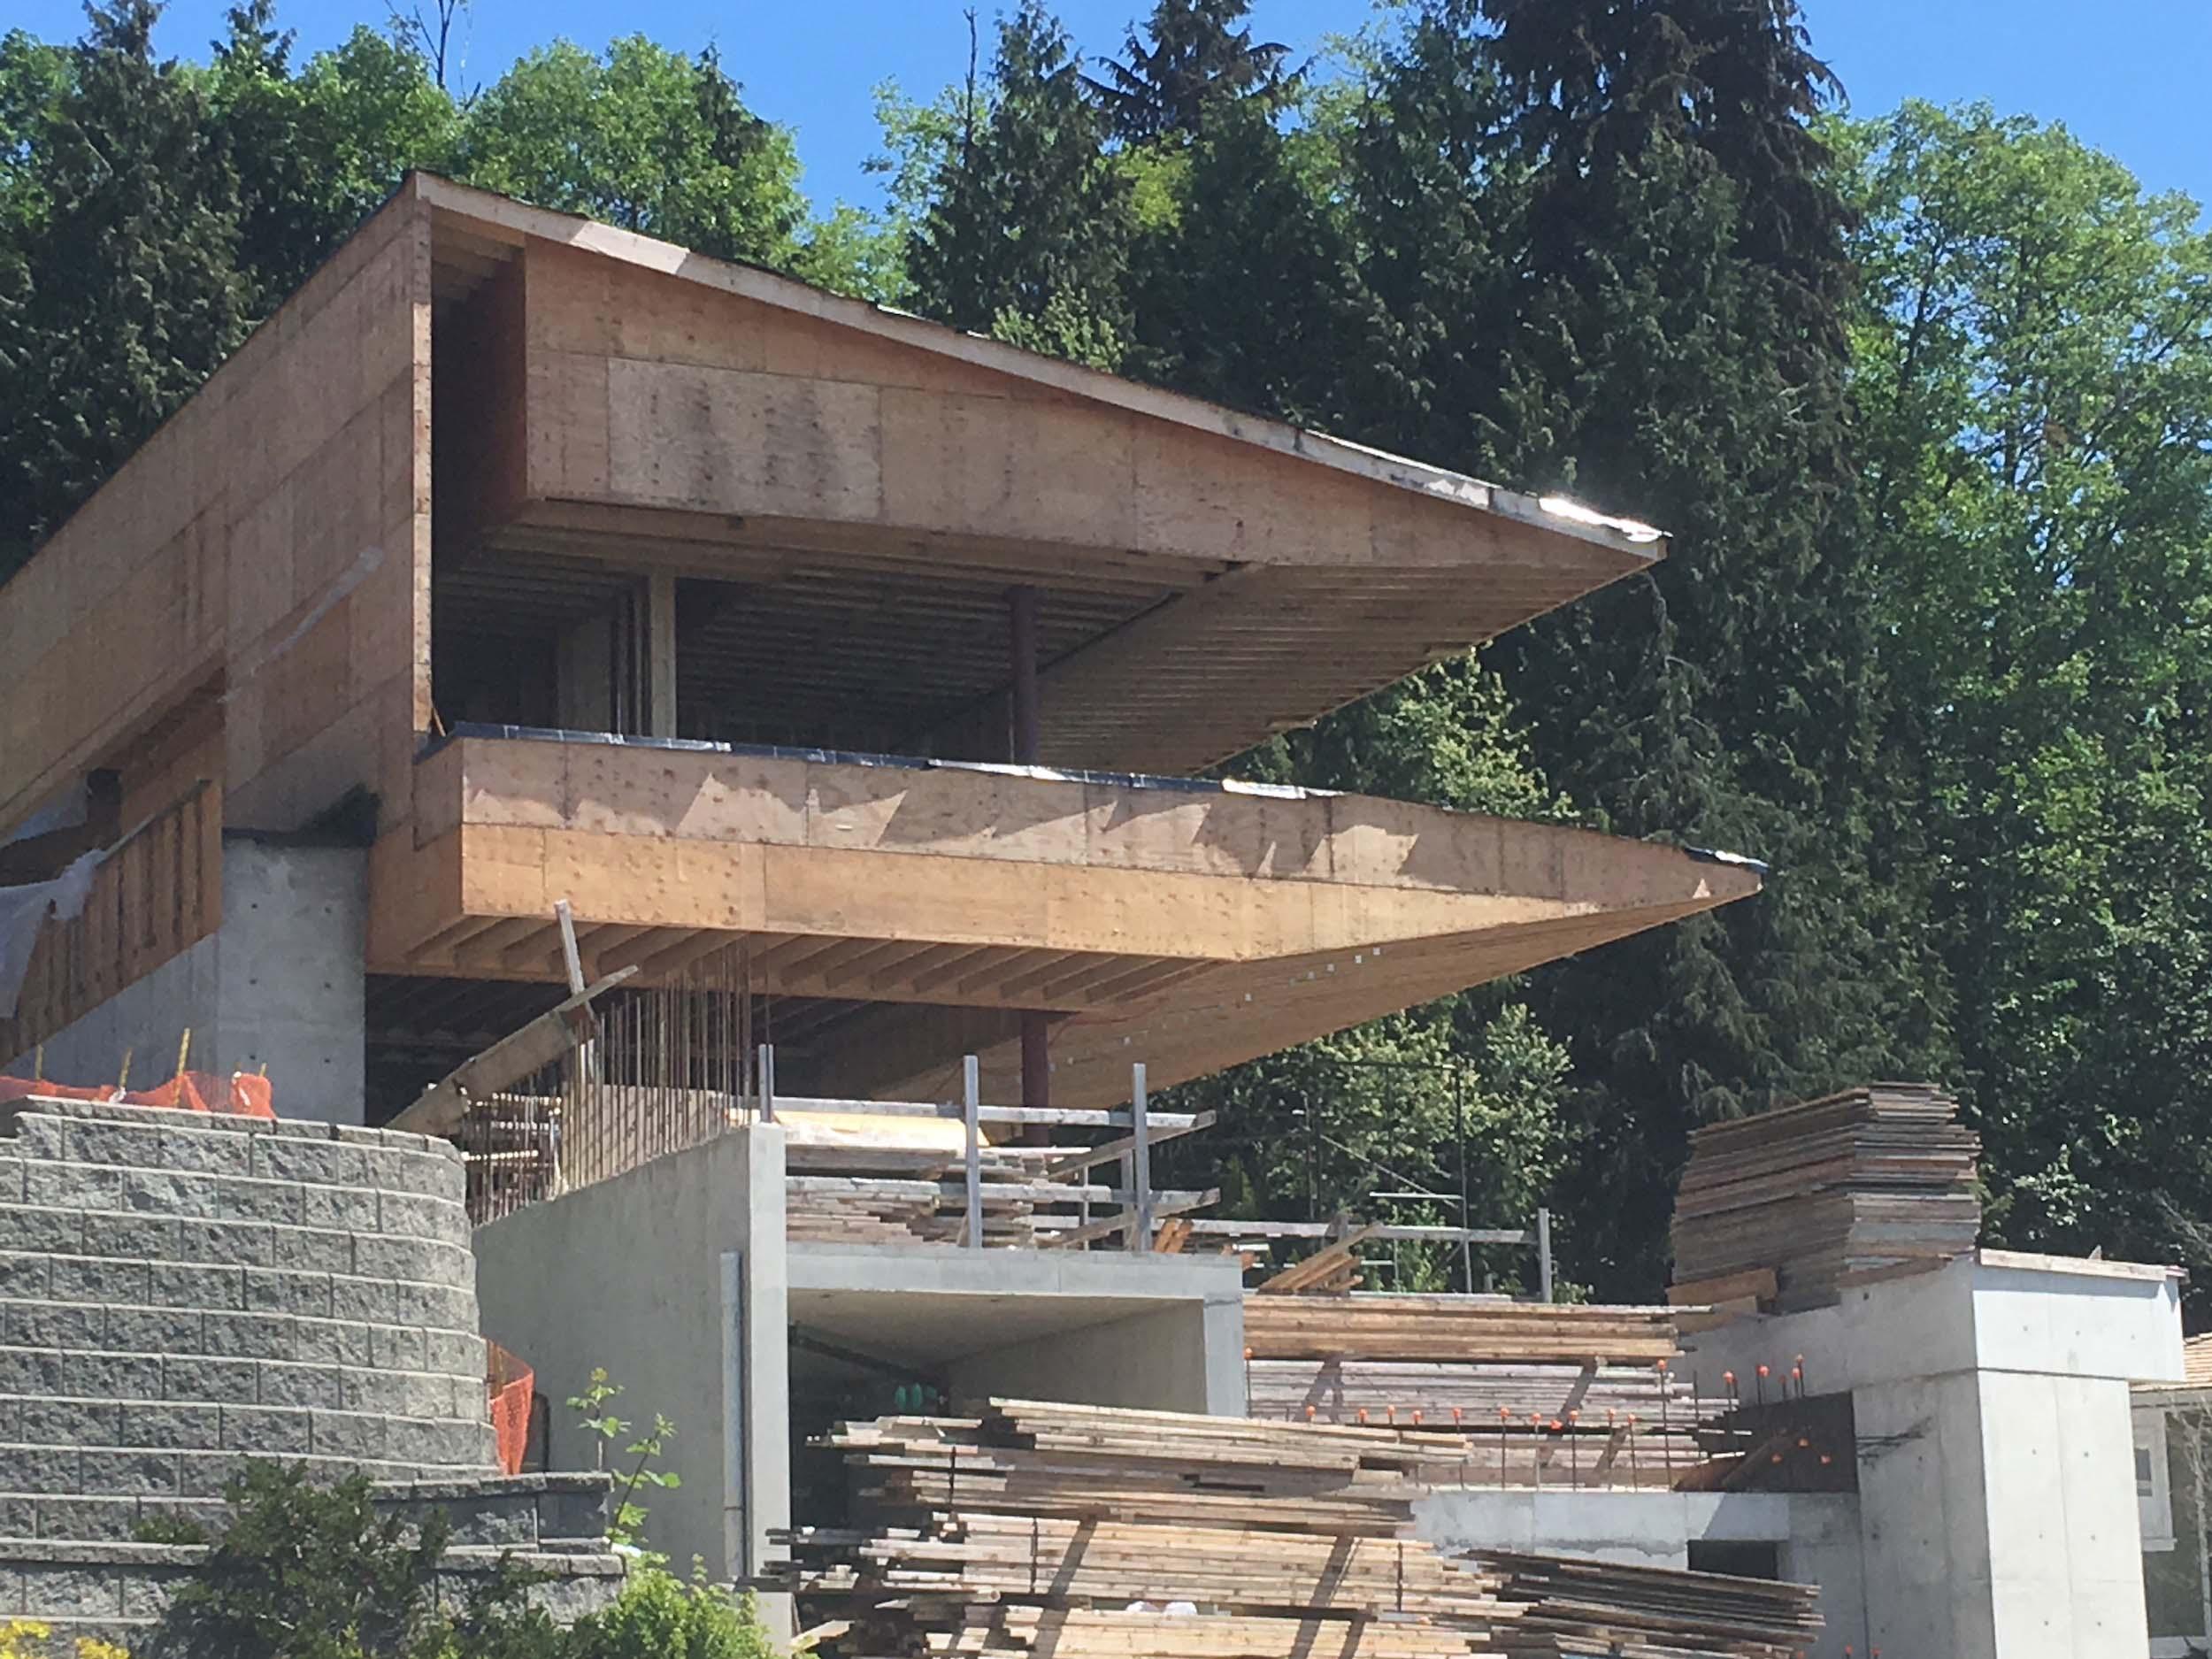 Postle_Construction_WoodFraming10.jpg